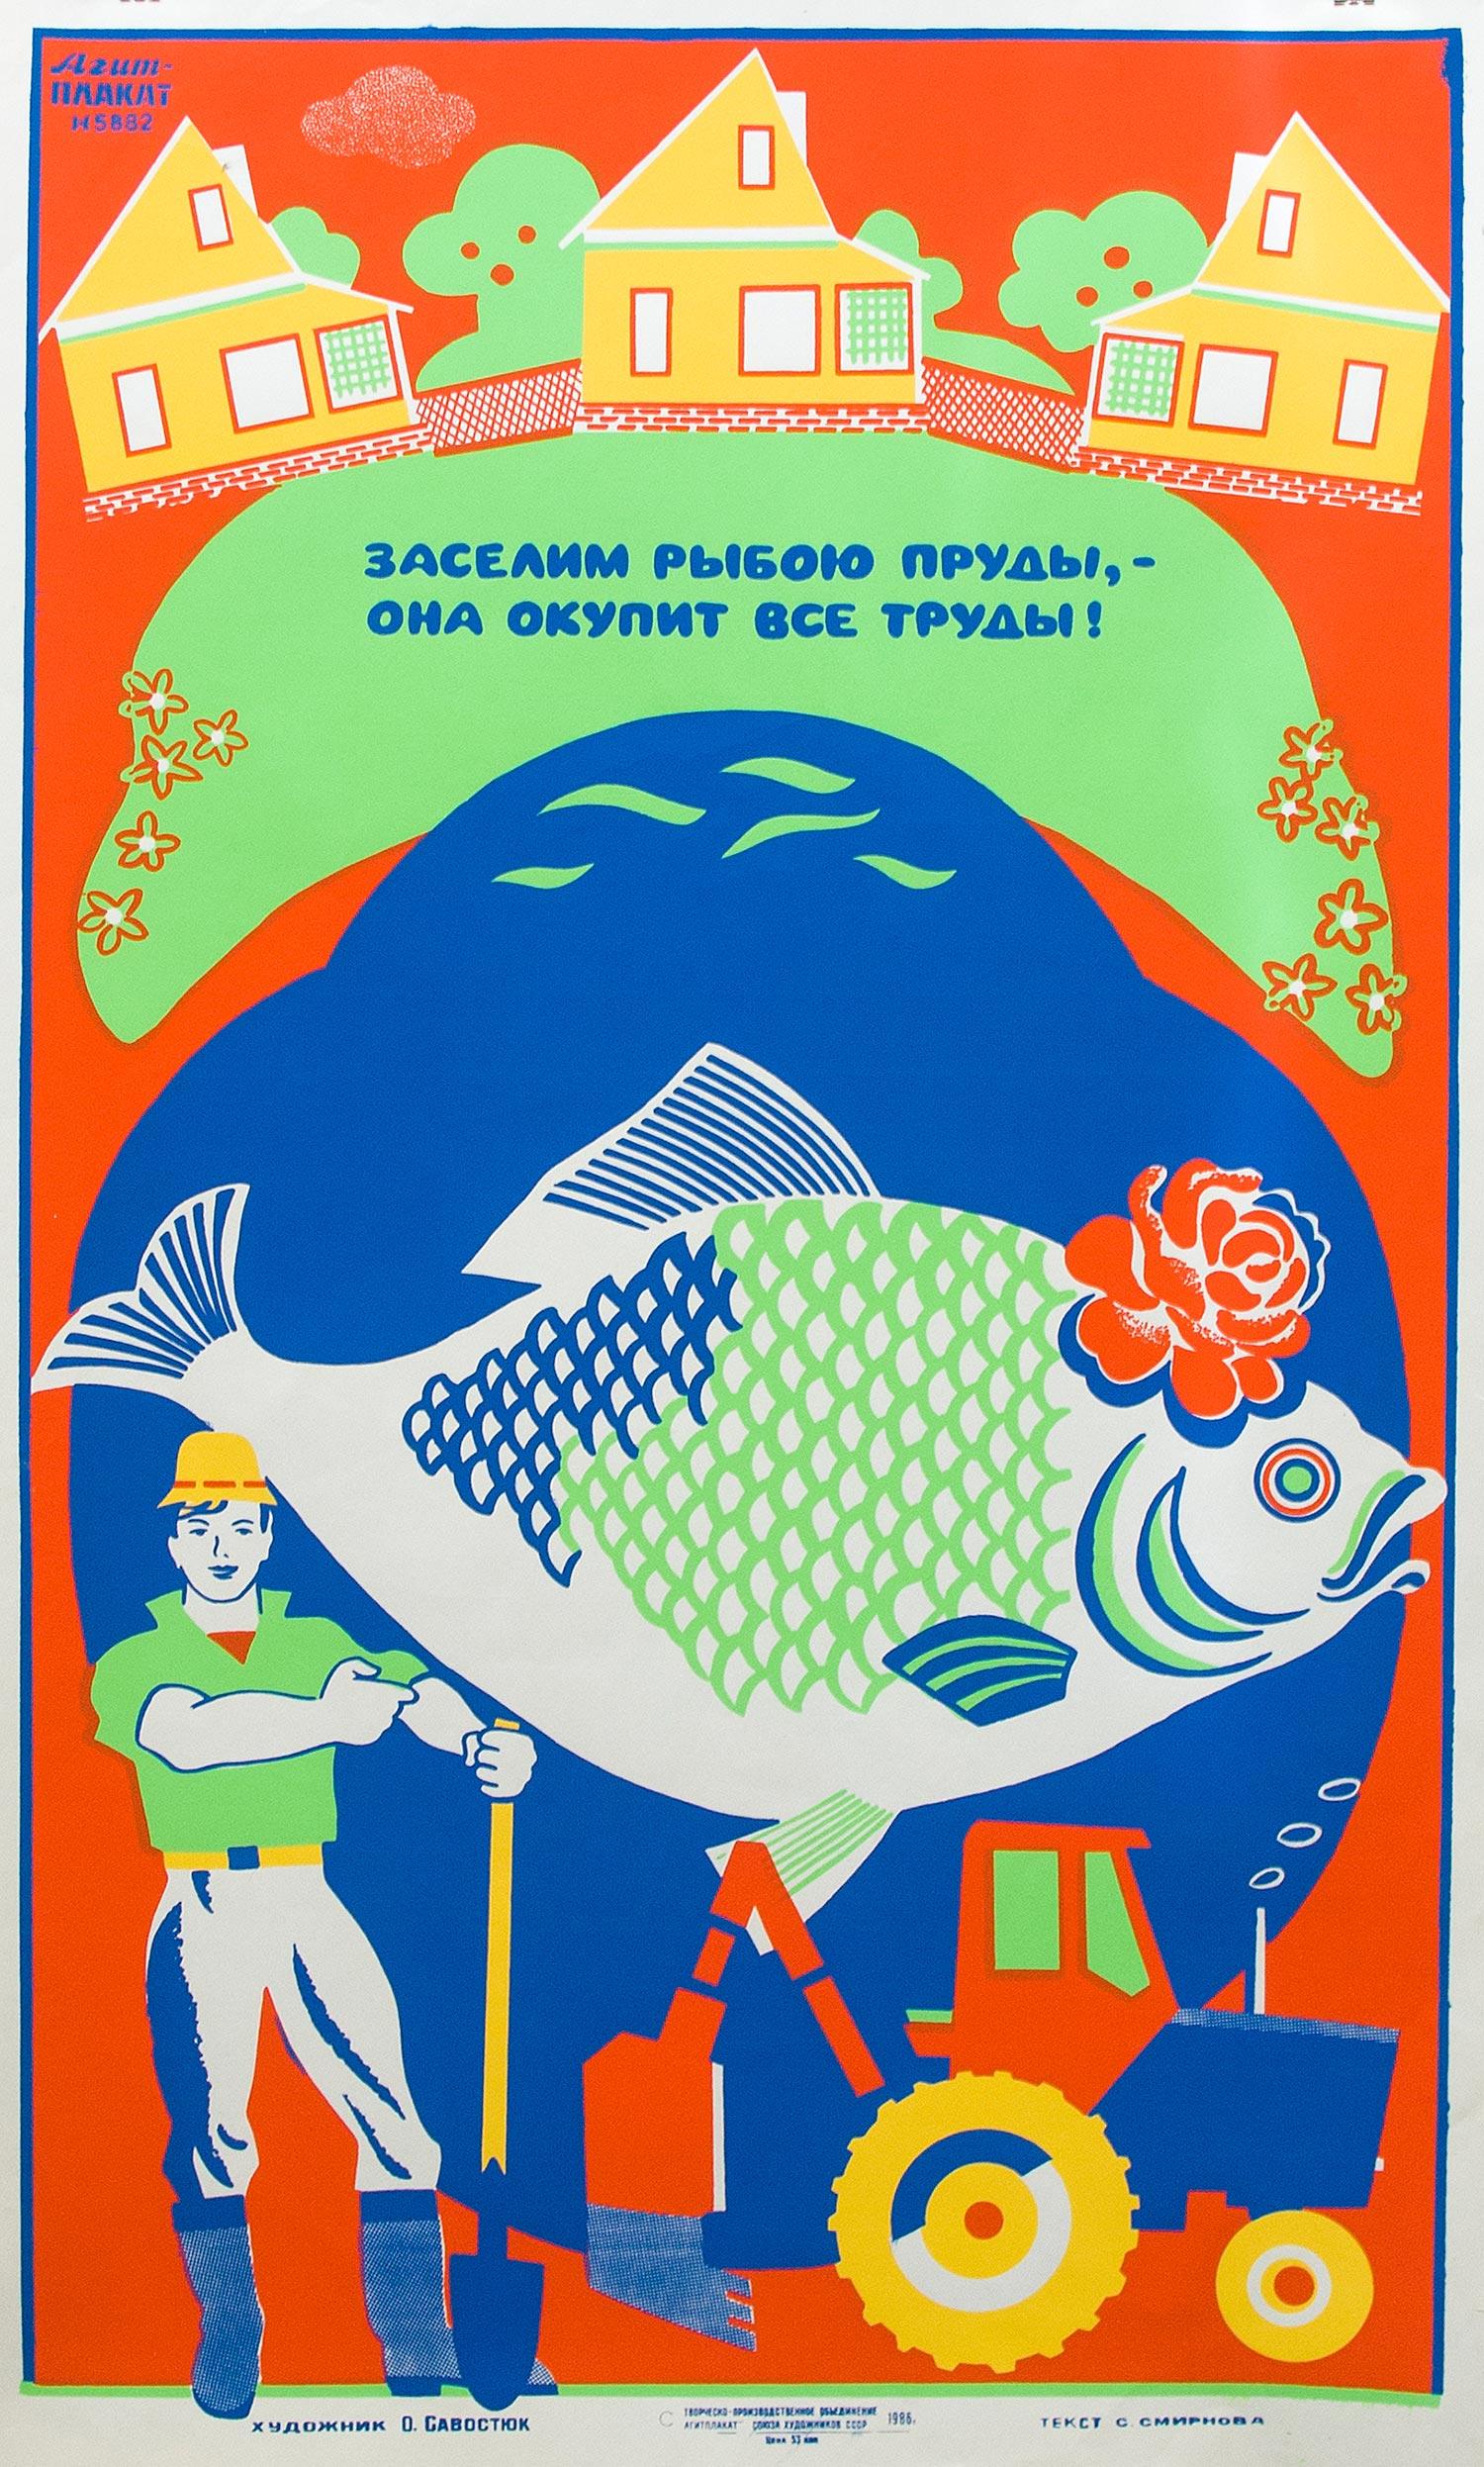 Заселим рыбою пруды -, она окупит все труды!